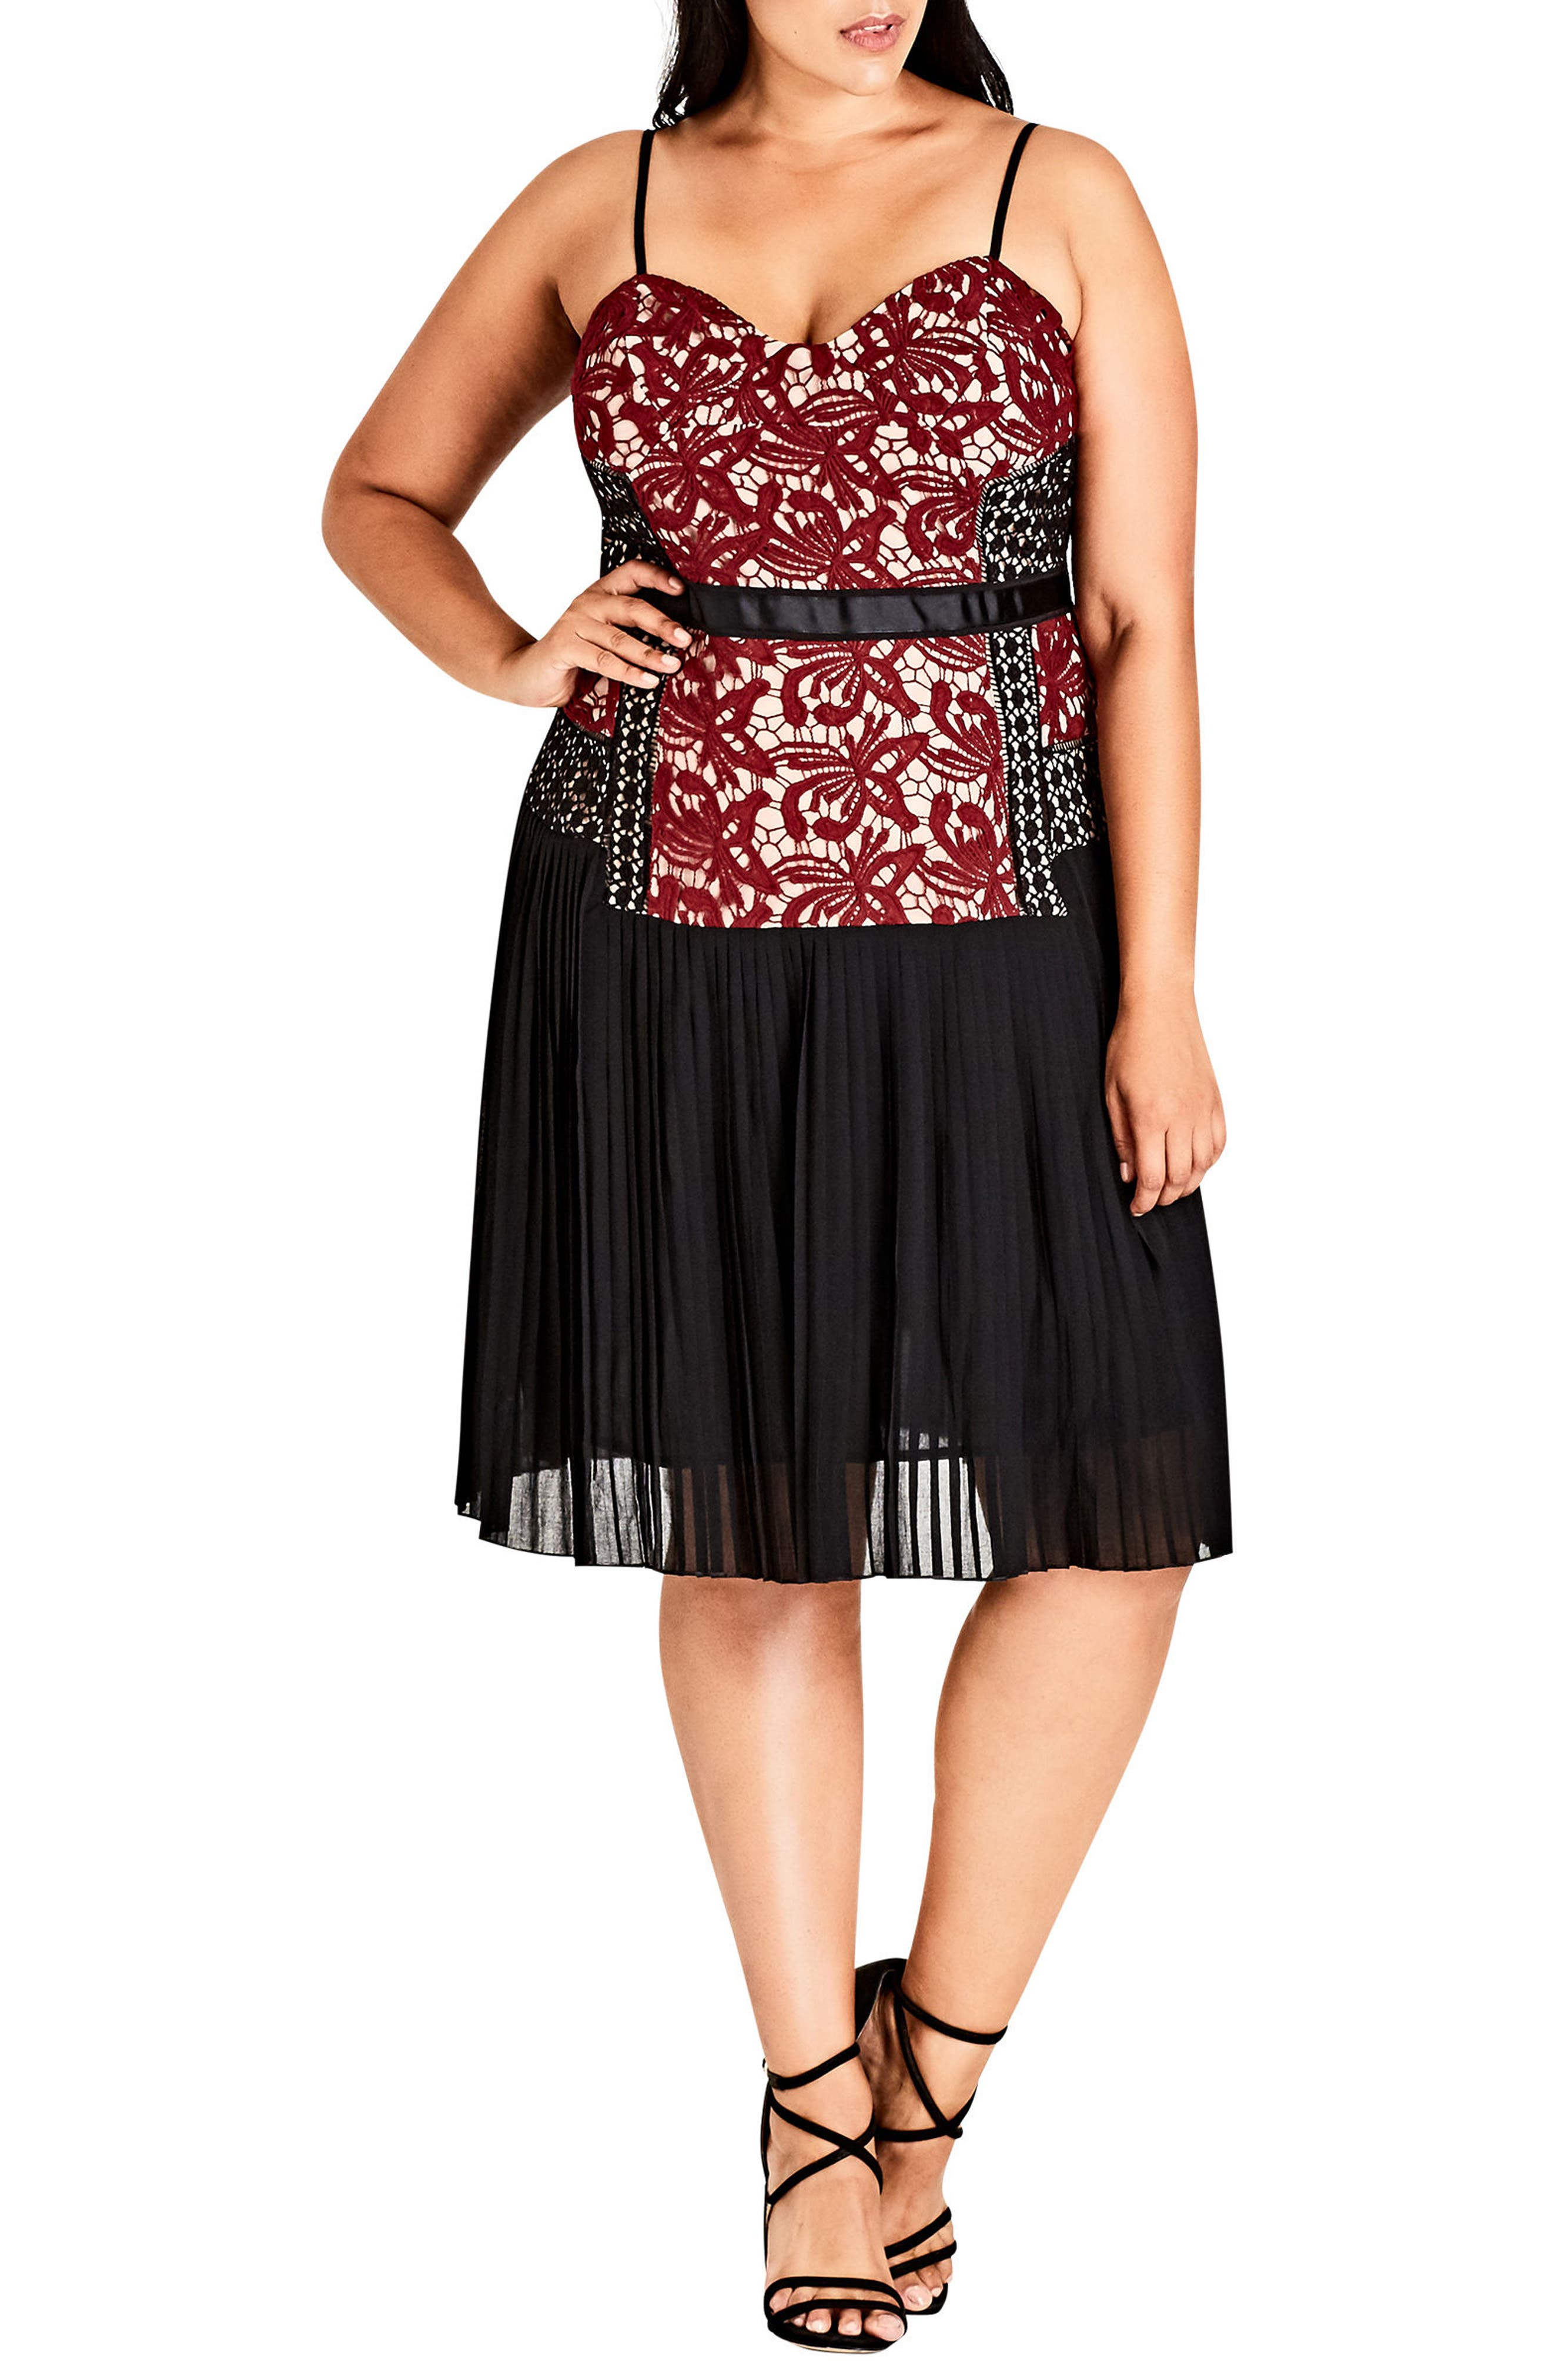 Obey Me Dress,                         Main,                         color, Black/ Ruby